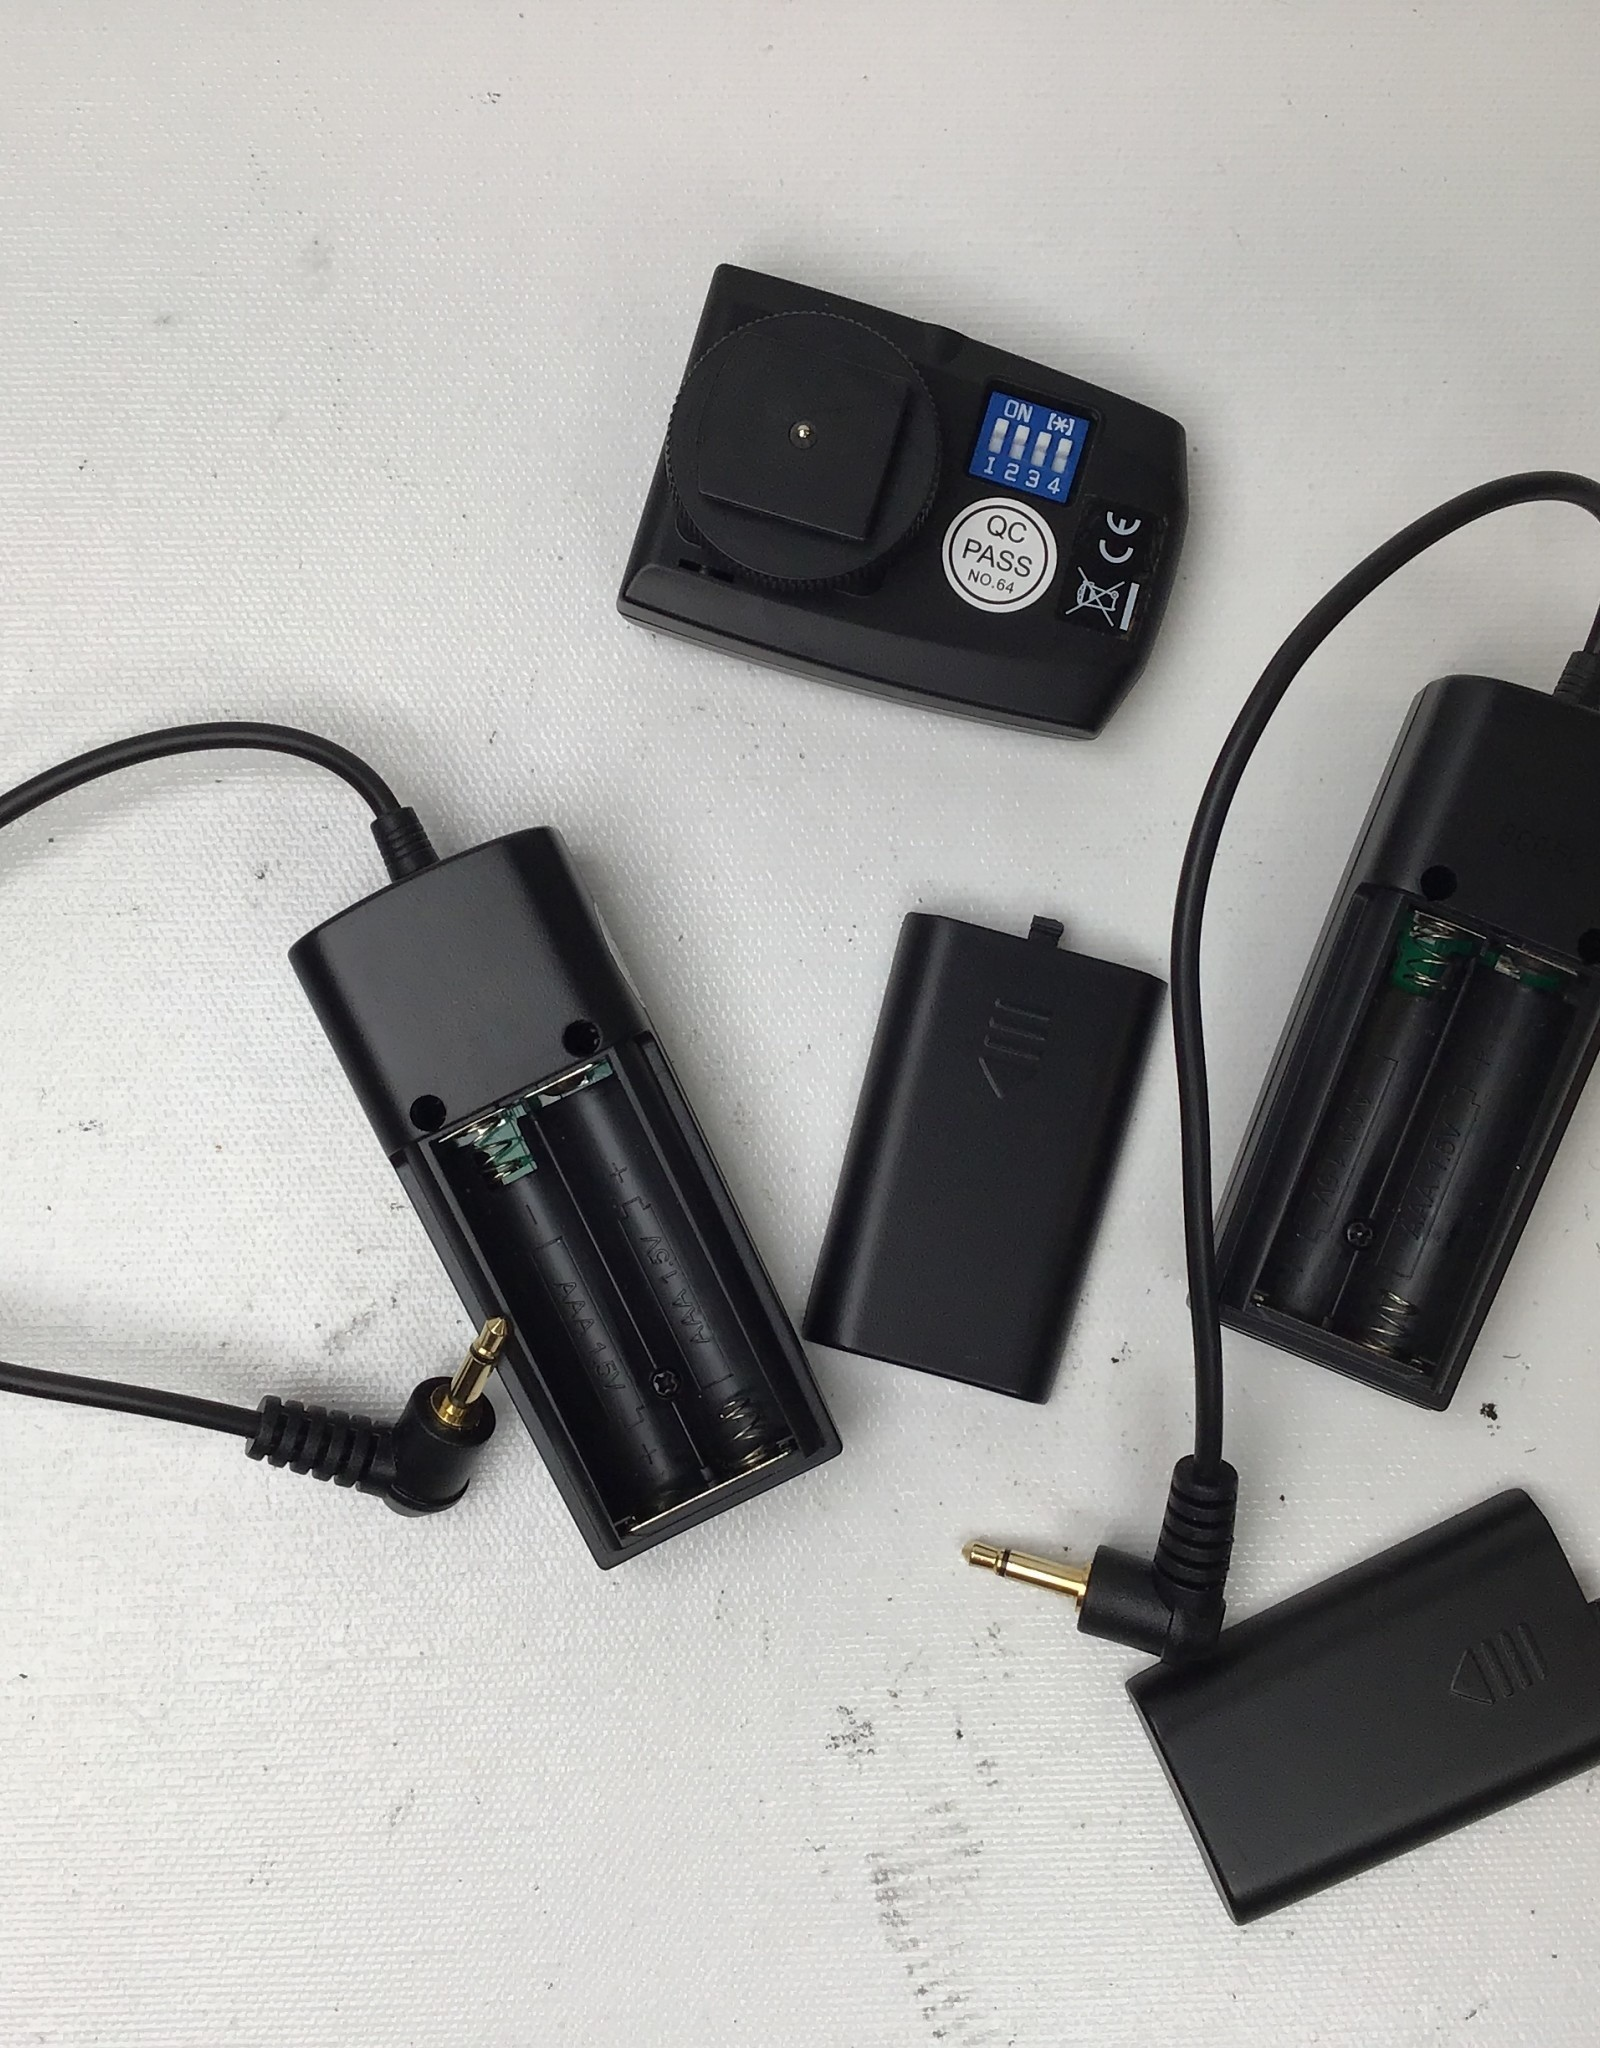 Neewer Neewer RT-16 Wireless Flash Set w/ 2 Receivers Used EX